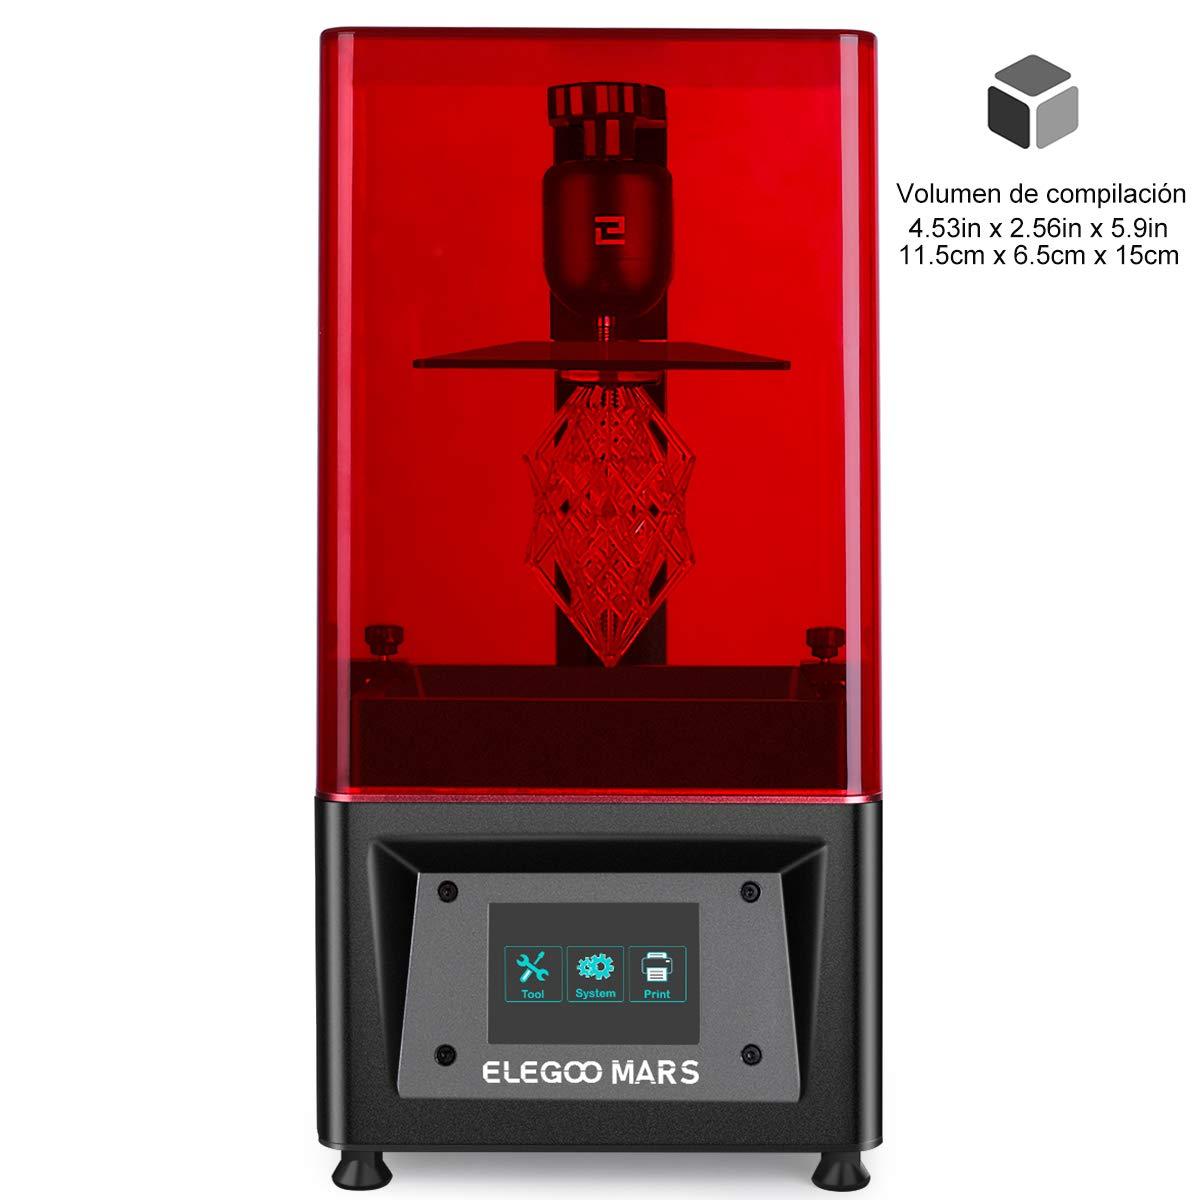 Impresora 3D de resina ELEGOO MARS 20€ mas barata